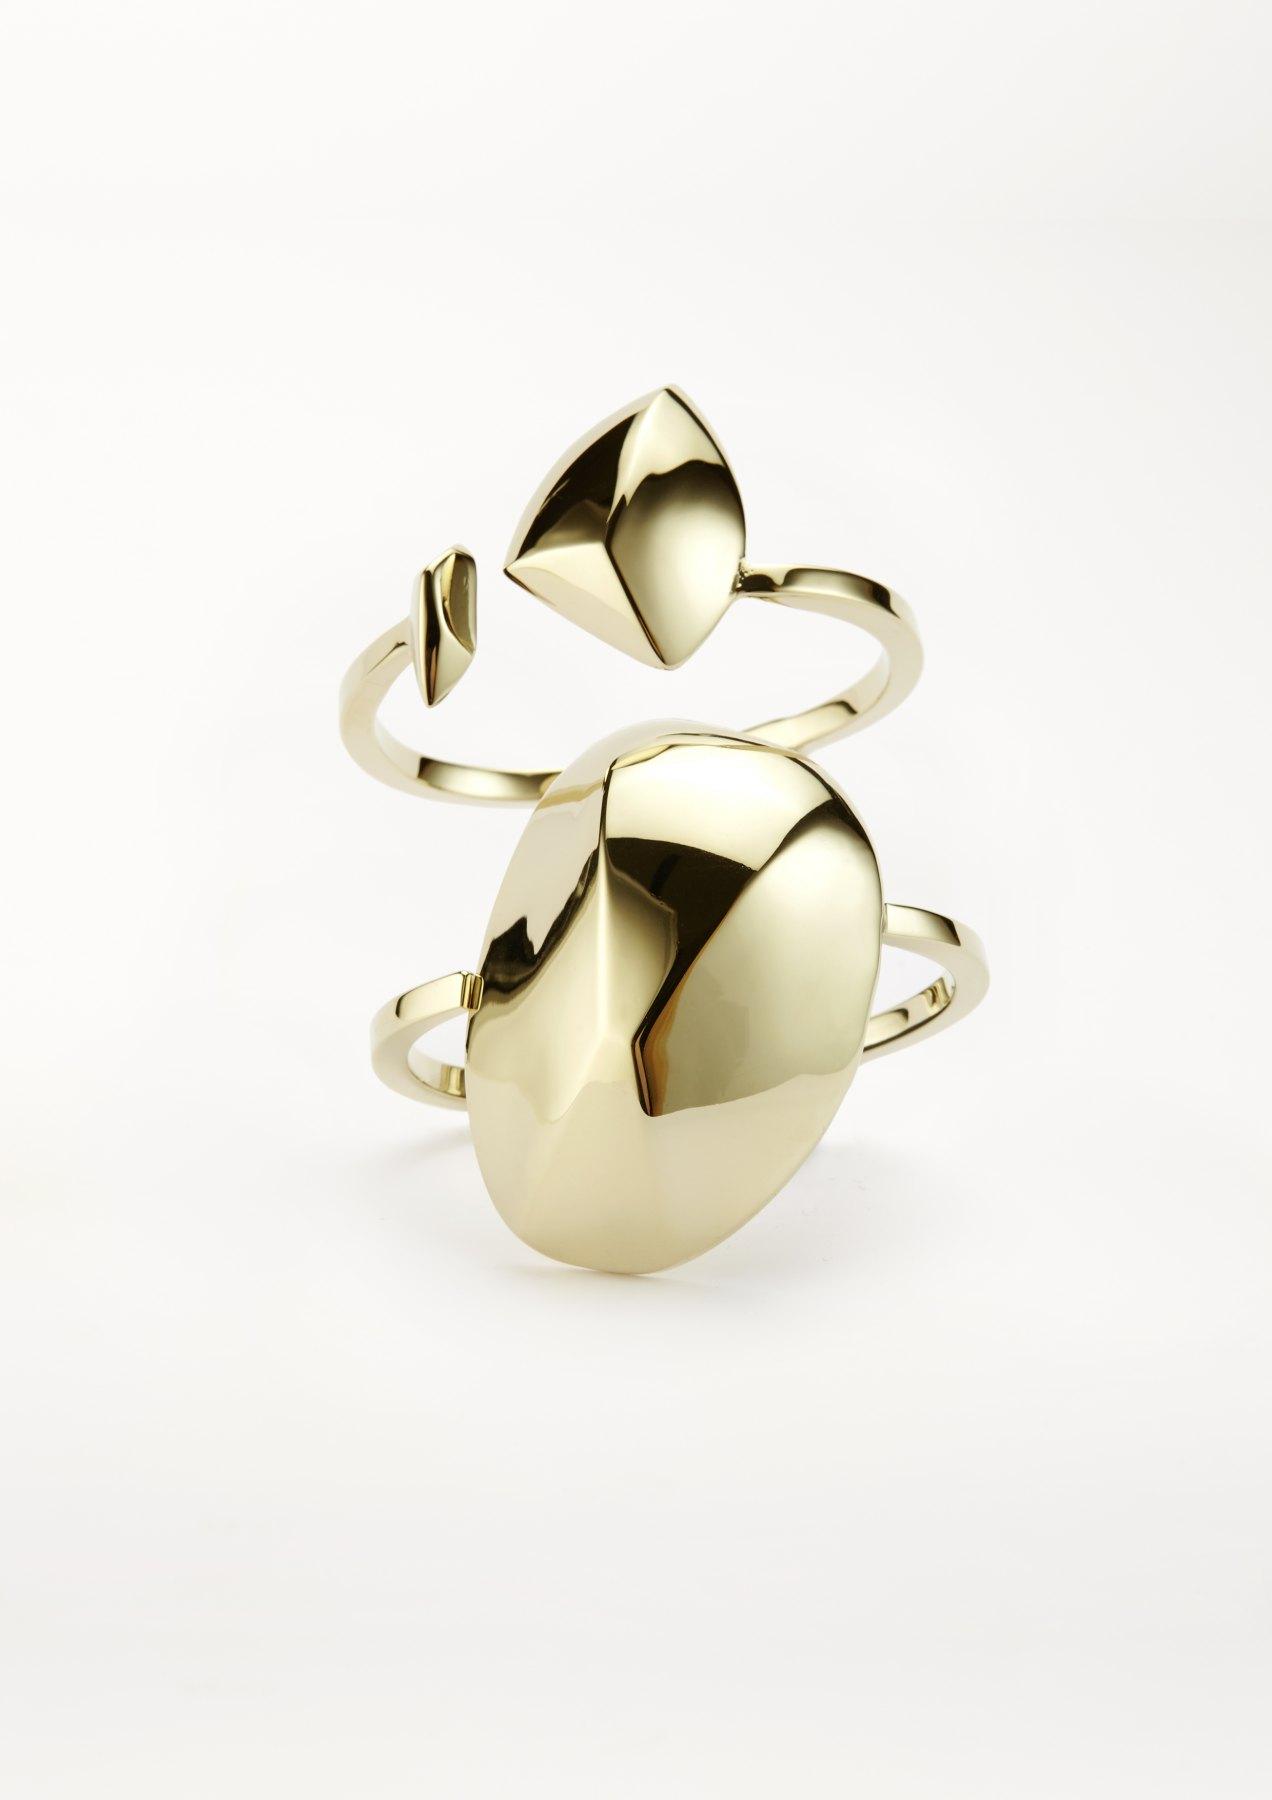 xenia bous schmuck Dancing Stone 10 Cuff gold silber